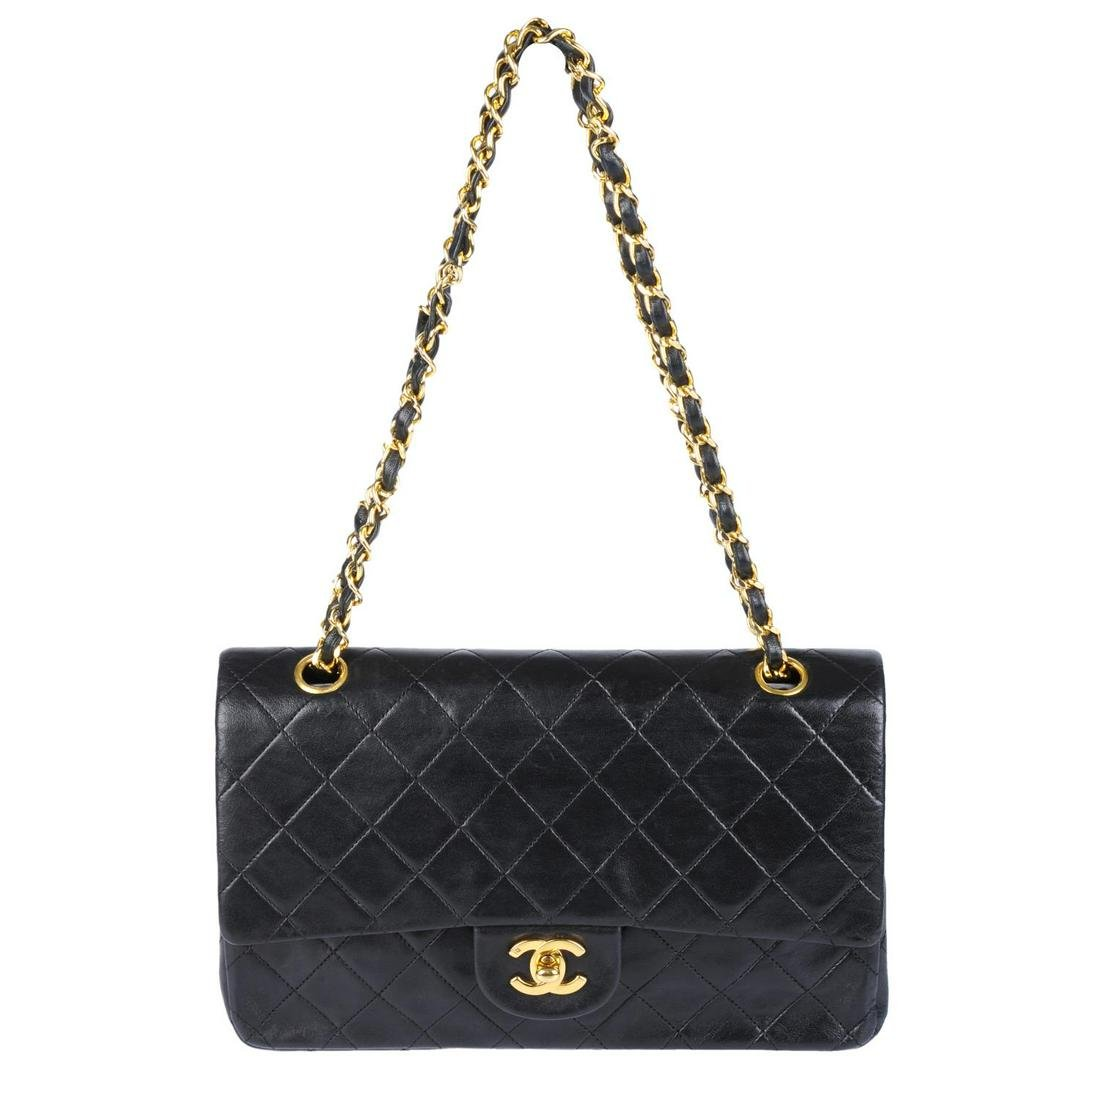 CHANEL - a vintage Medium Classic Double Flap handbag.